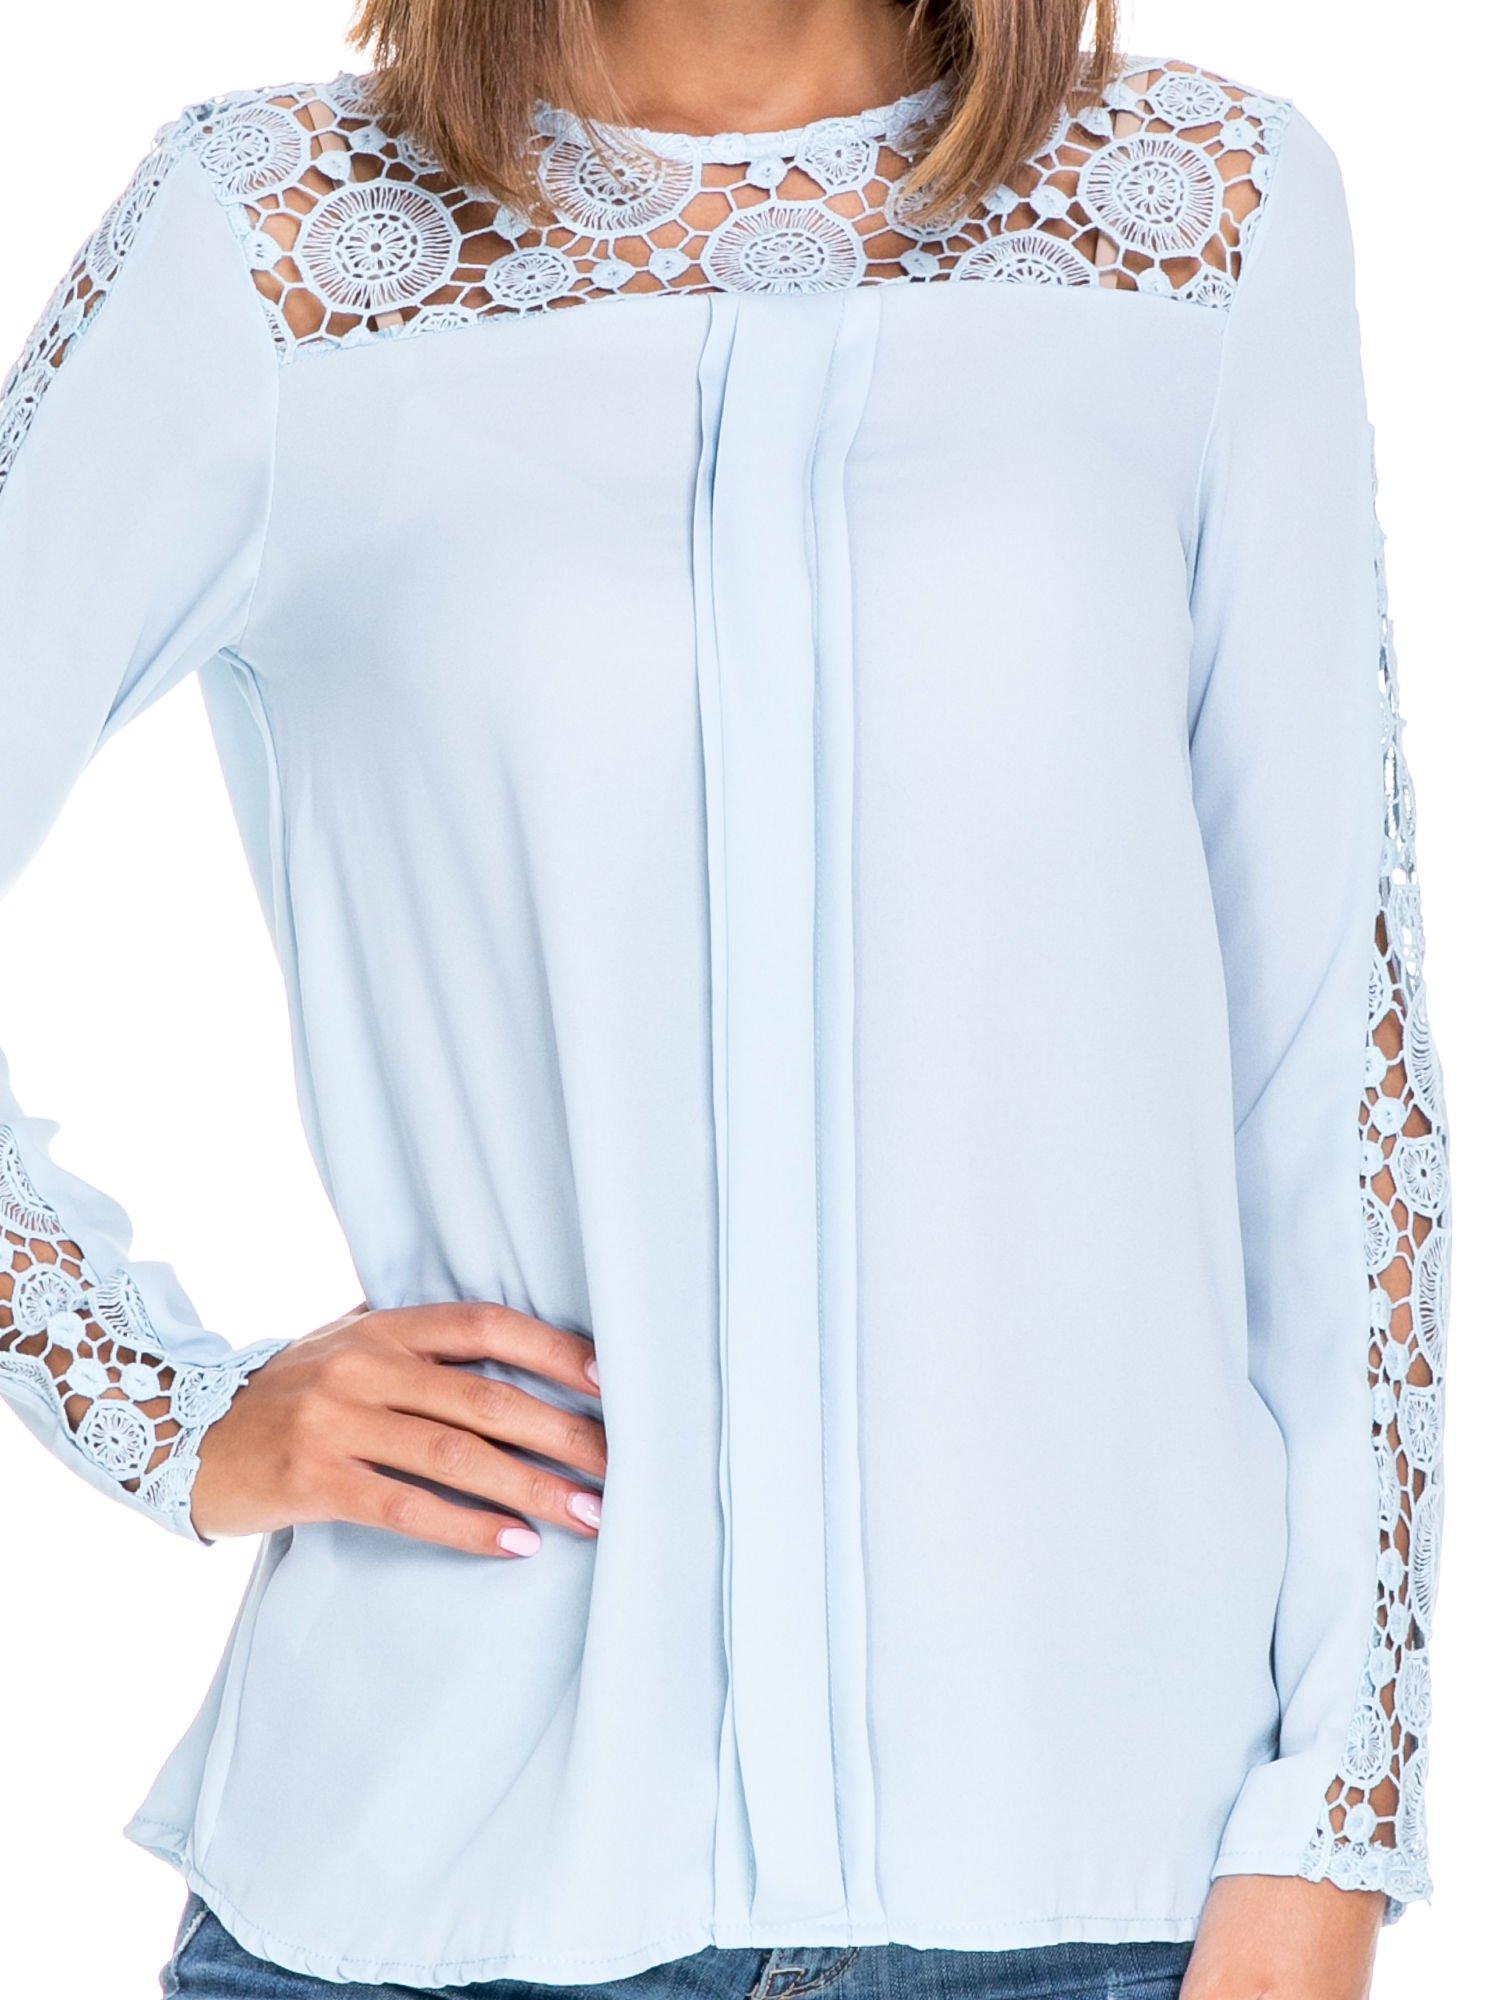 Niebieska koszula z gipiurą                                  zdj.                                  5